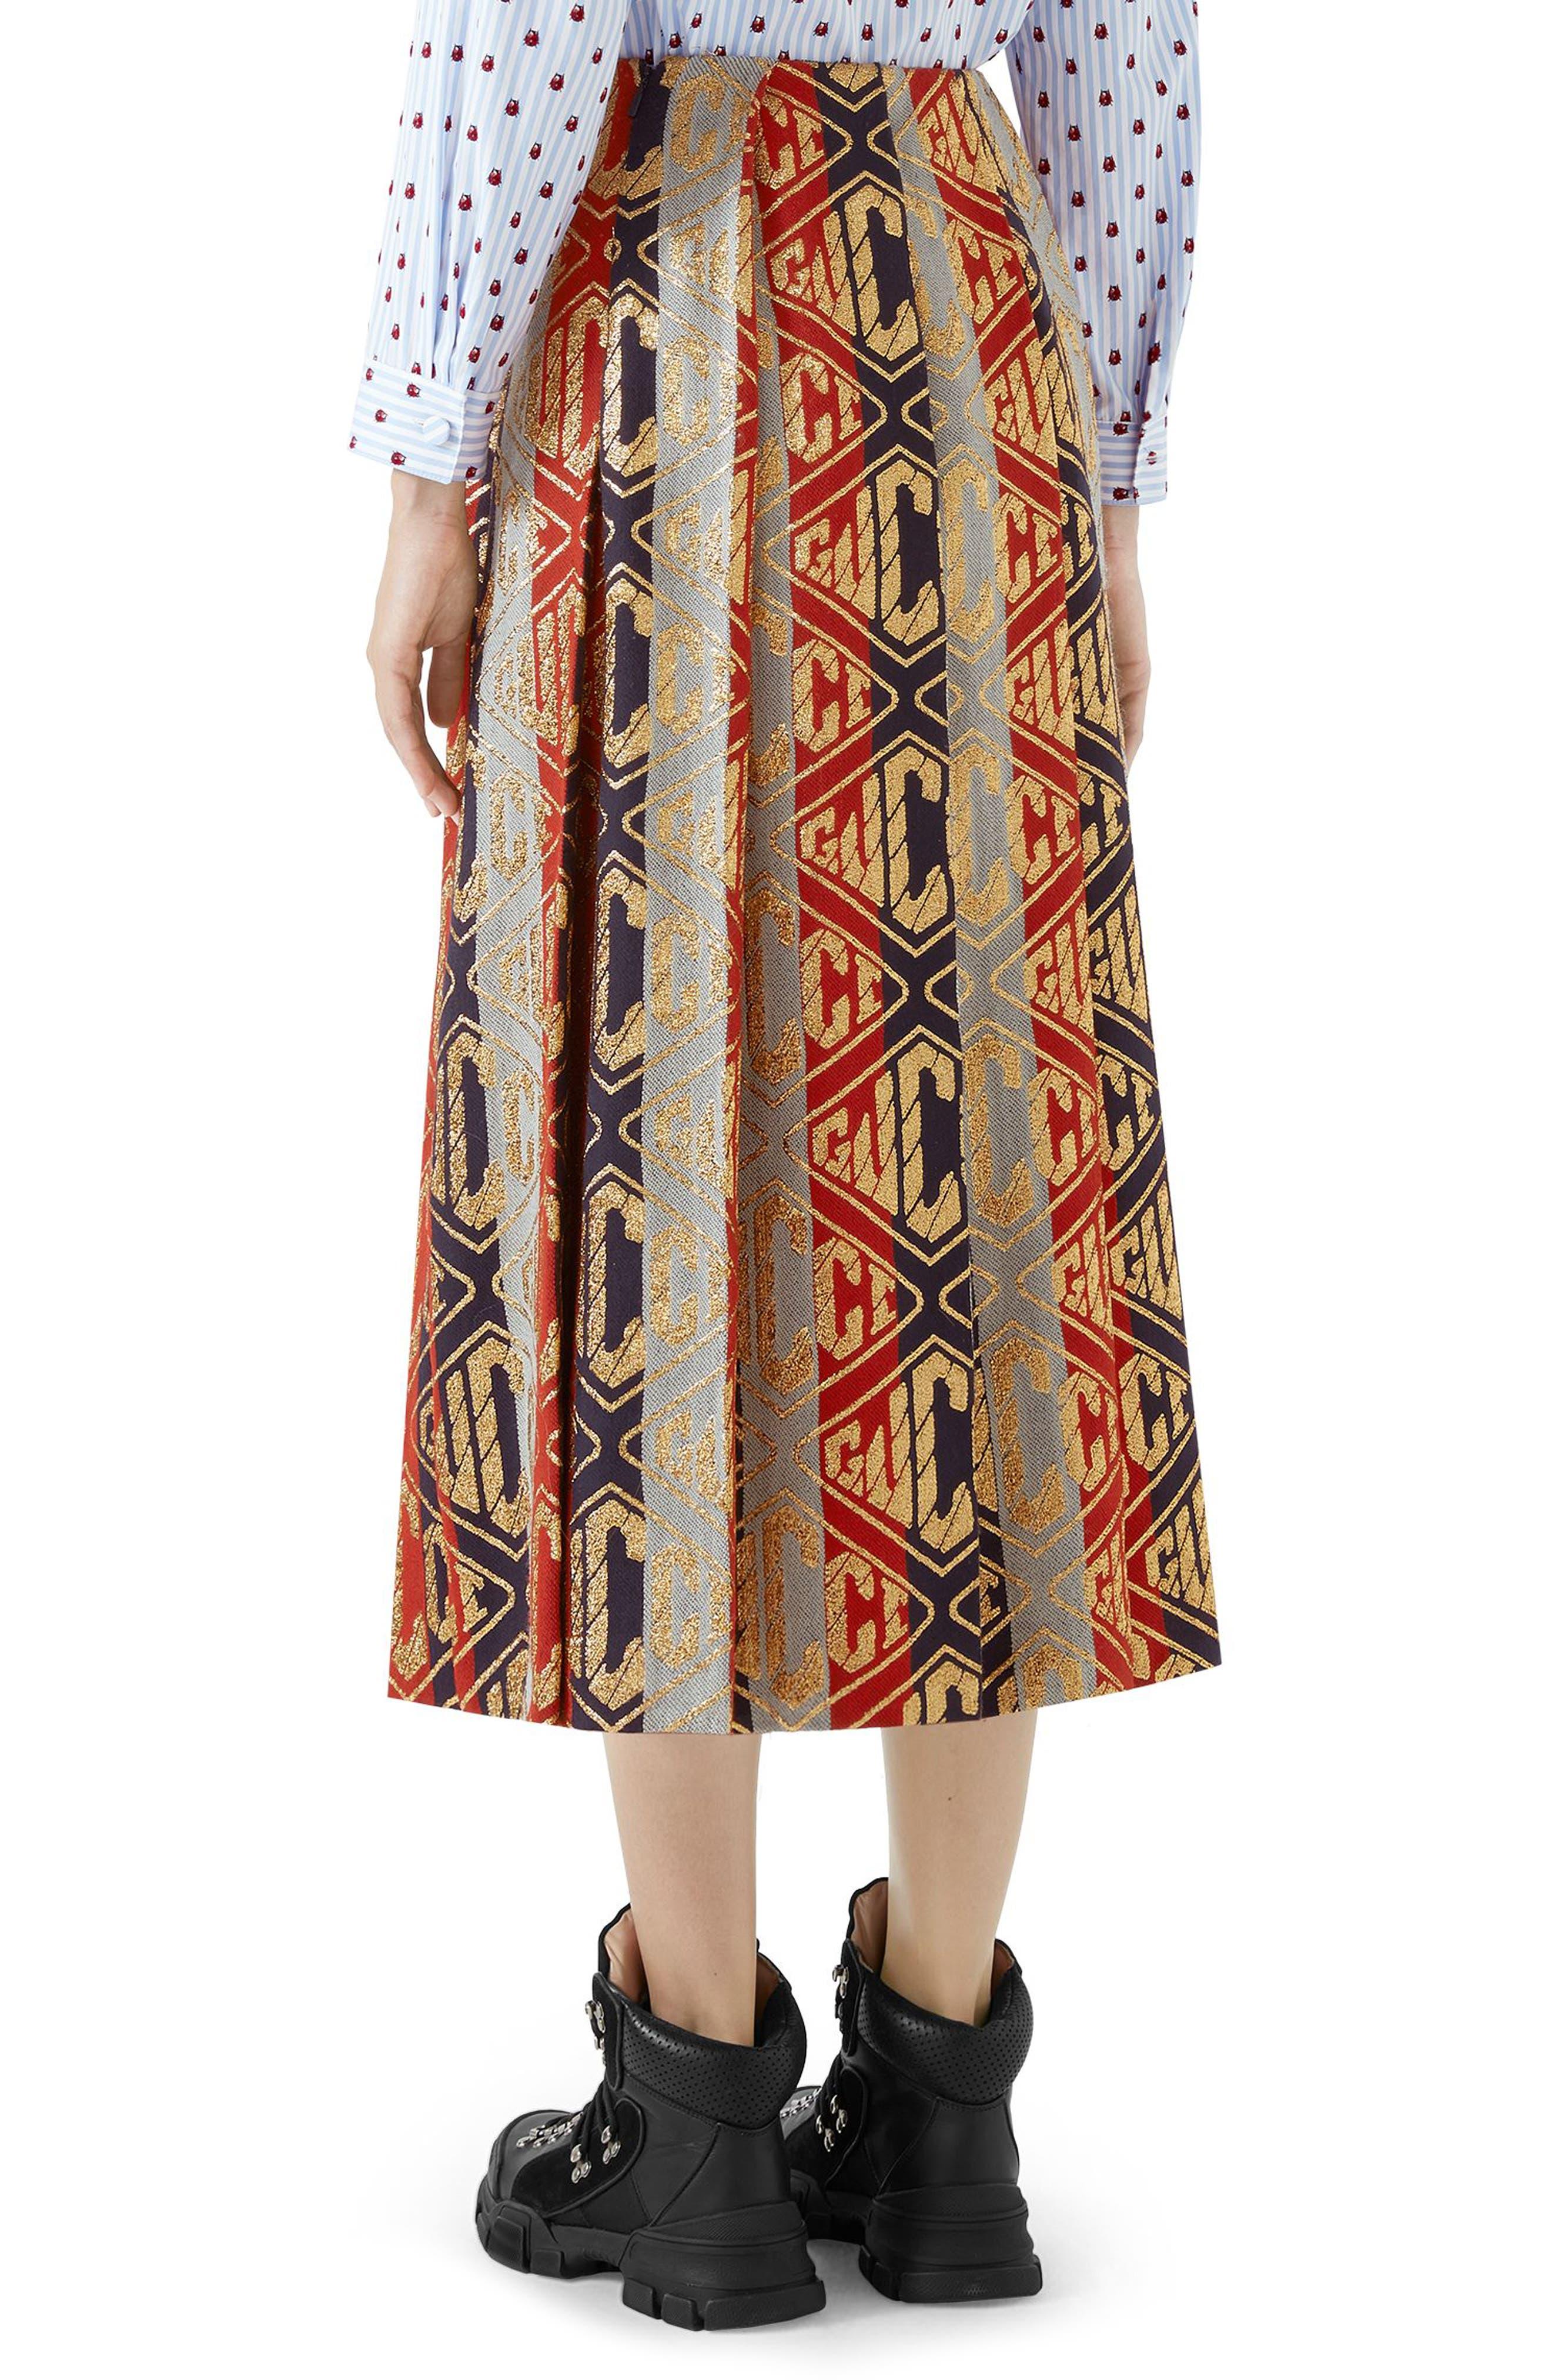 GUCCI,                             Metallic Logo Pleated Wool Blend Skirt,                             Alternate thumbnail 2, color,                             SYLVIE LUREX